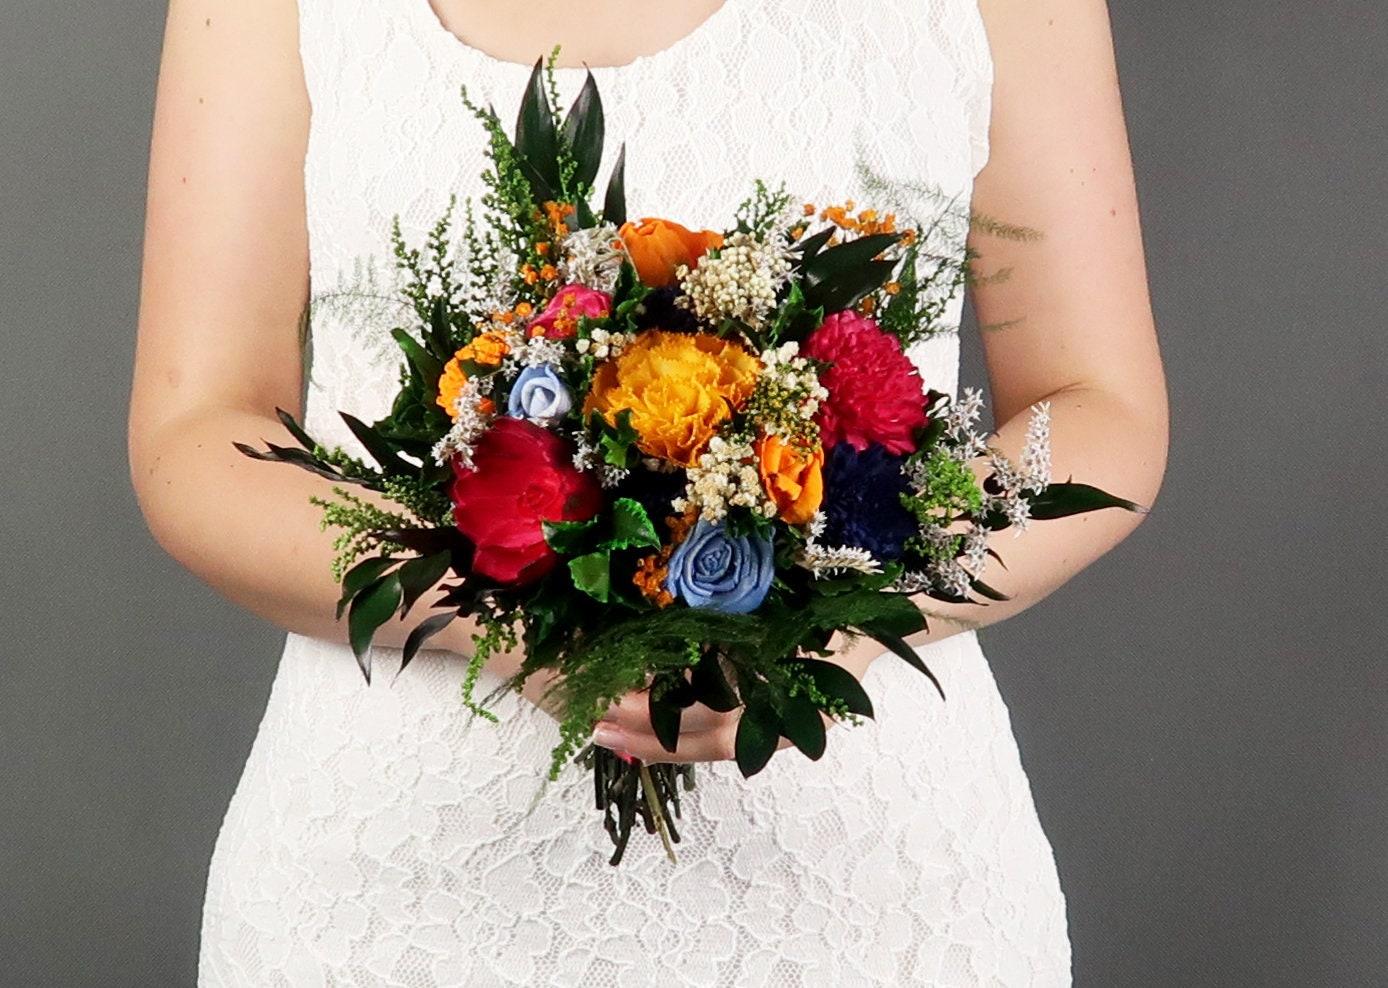 Colorful Vibrant Wild Wedding Bouquet Sola Flowers In Yellow Orange